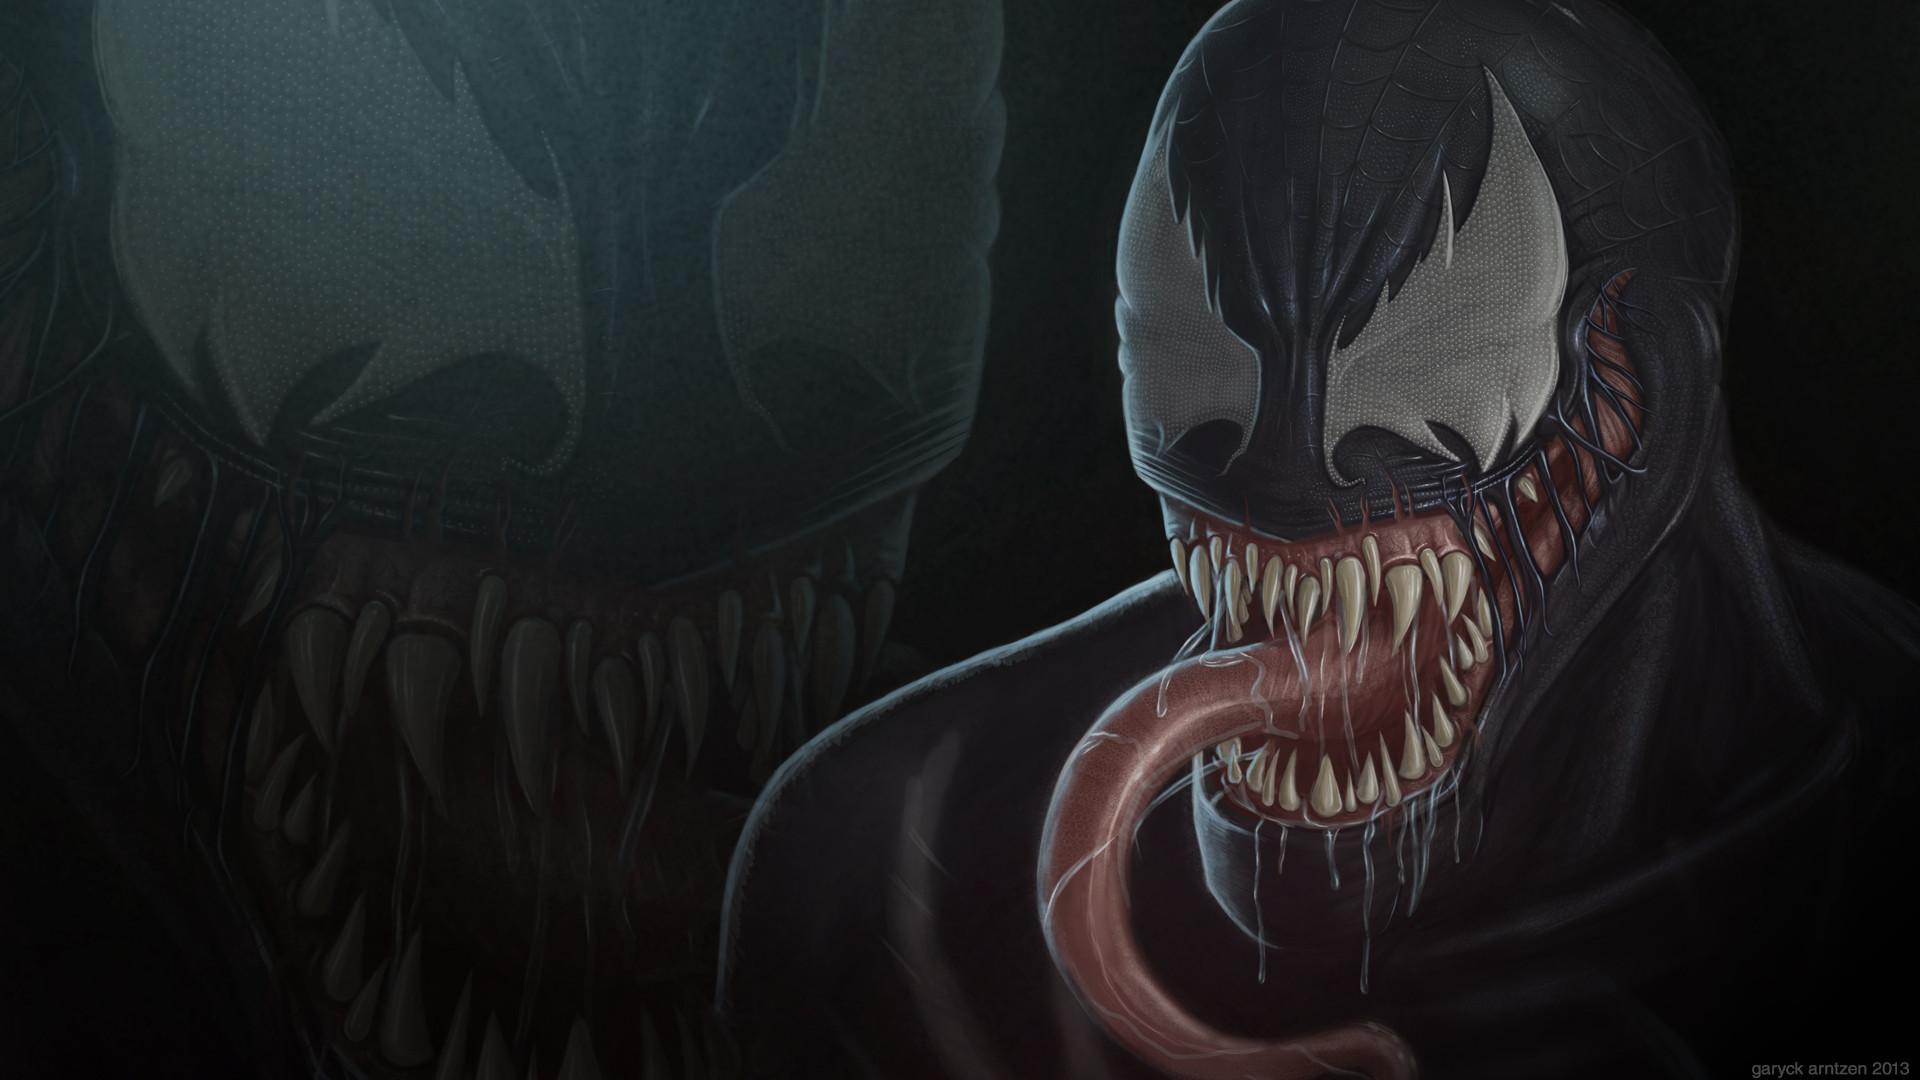 Related Pictures download venom wallpaper ultimate spiderman venom